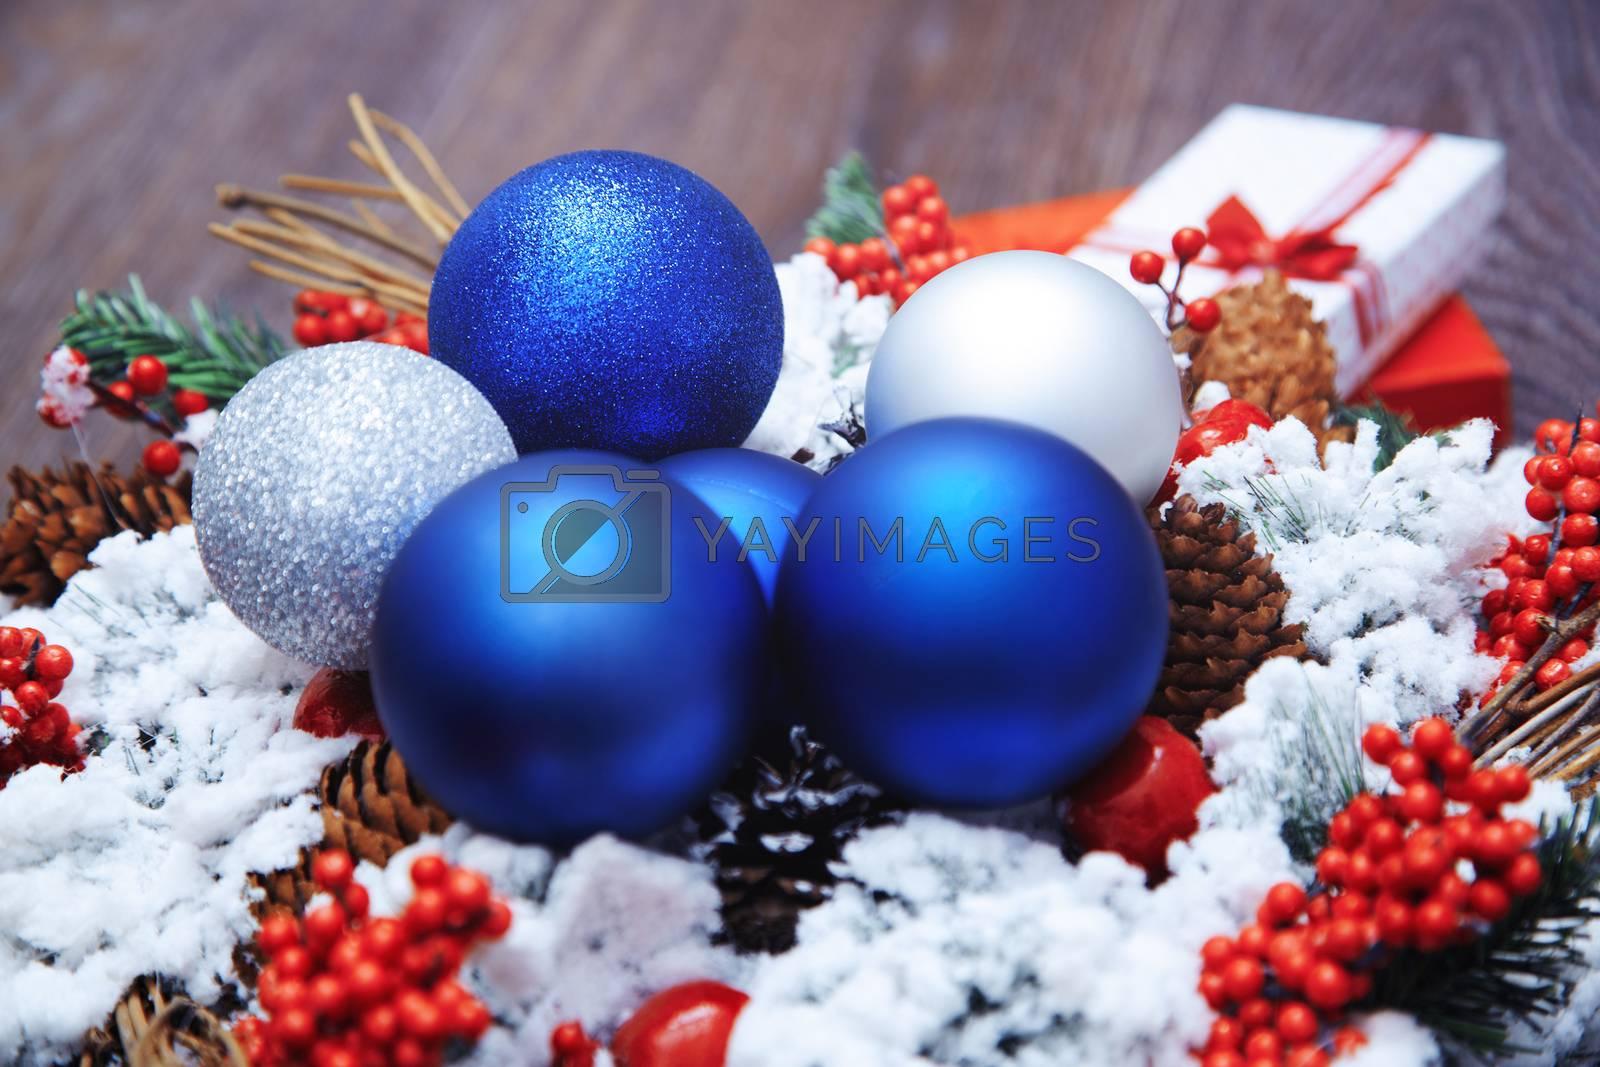 Christmas wreath and toys. Close-up horizontal photo